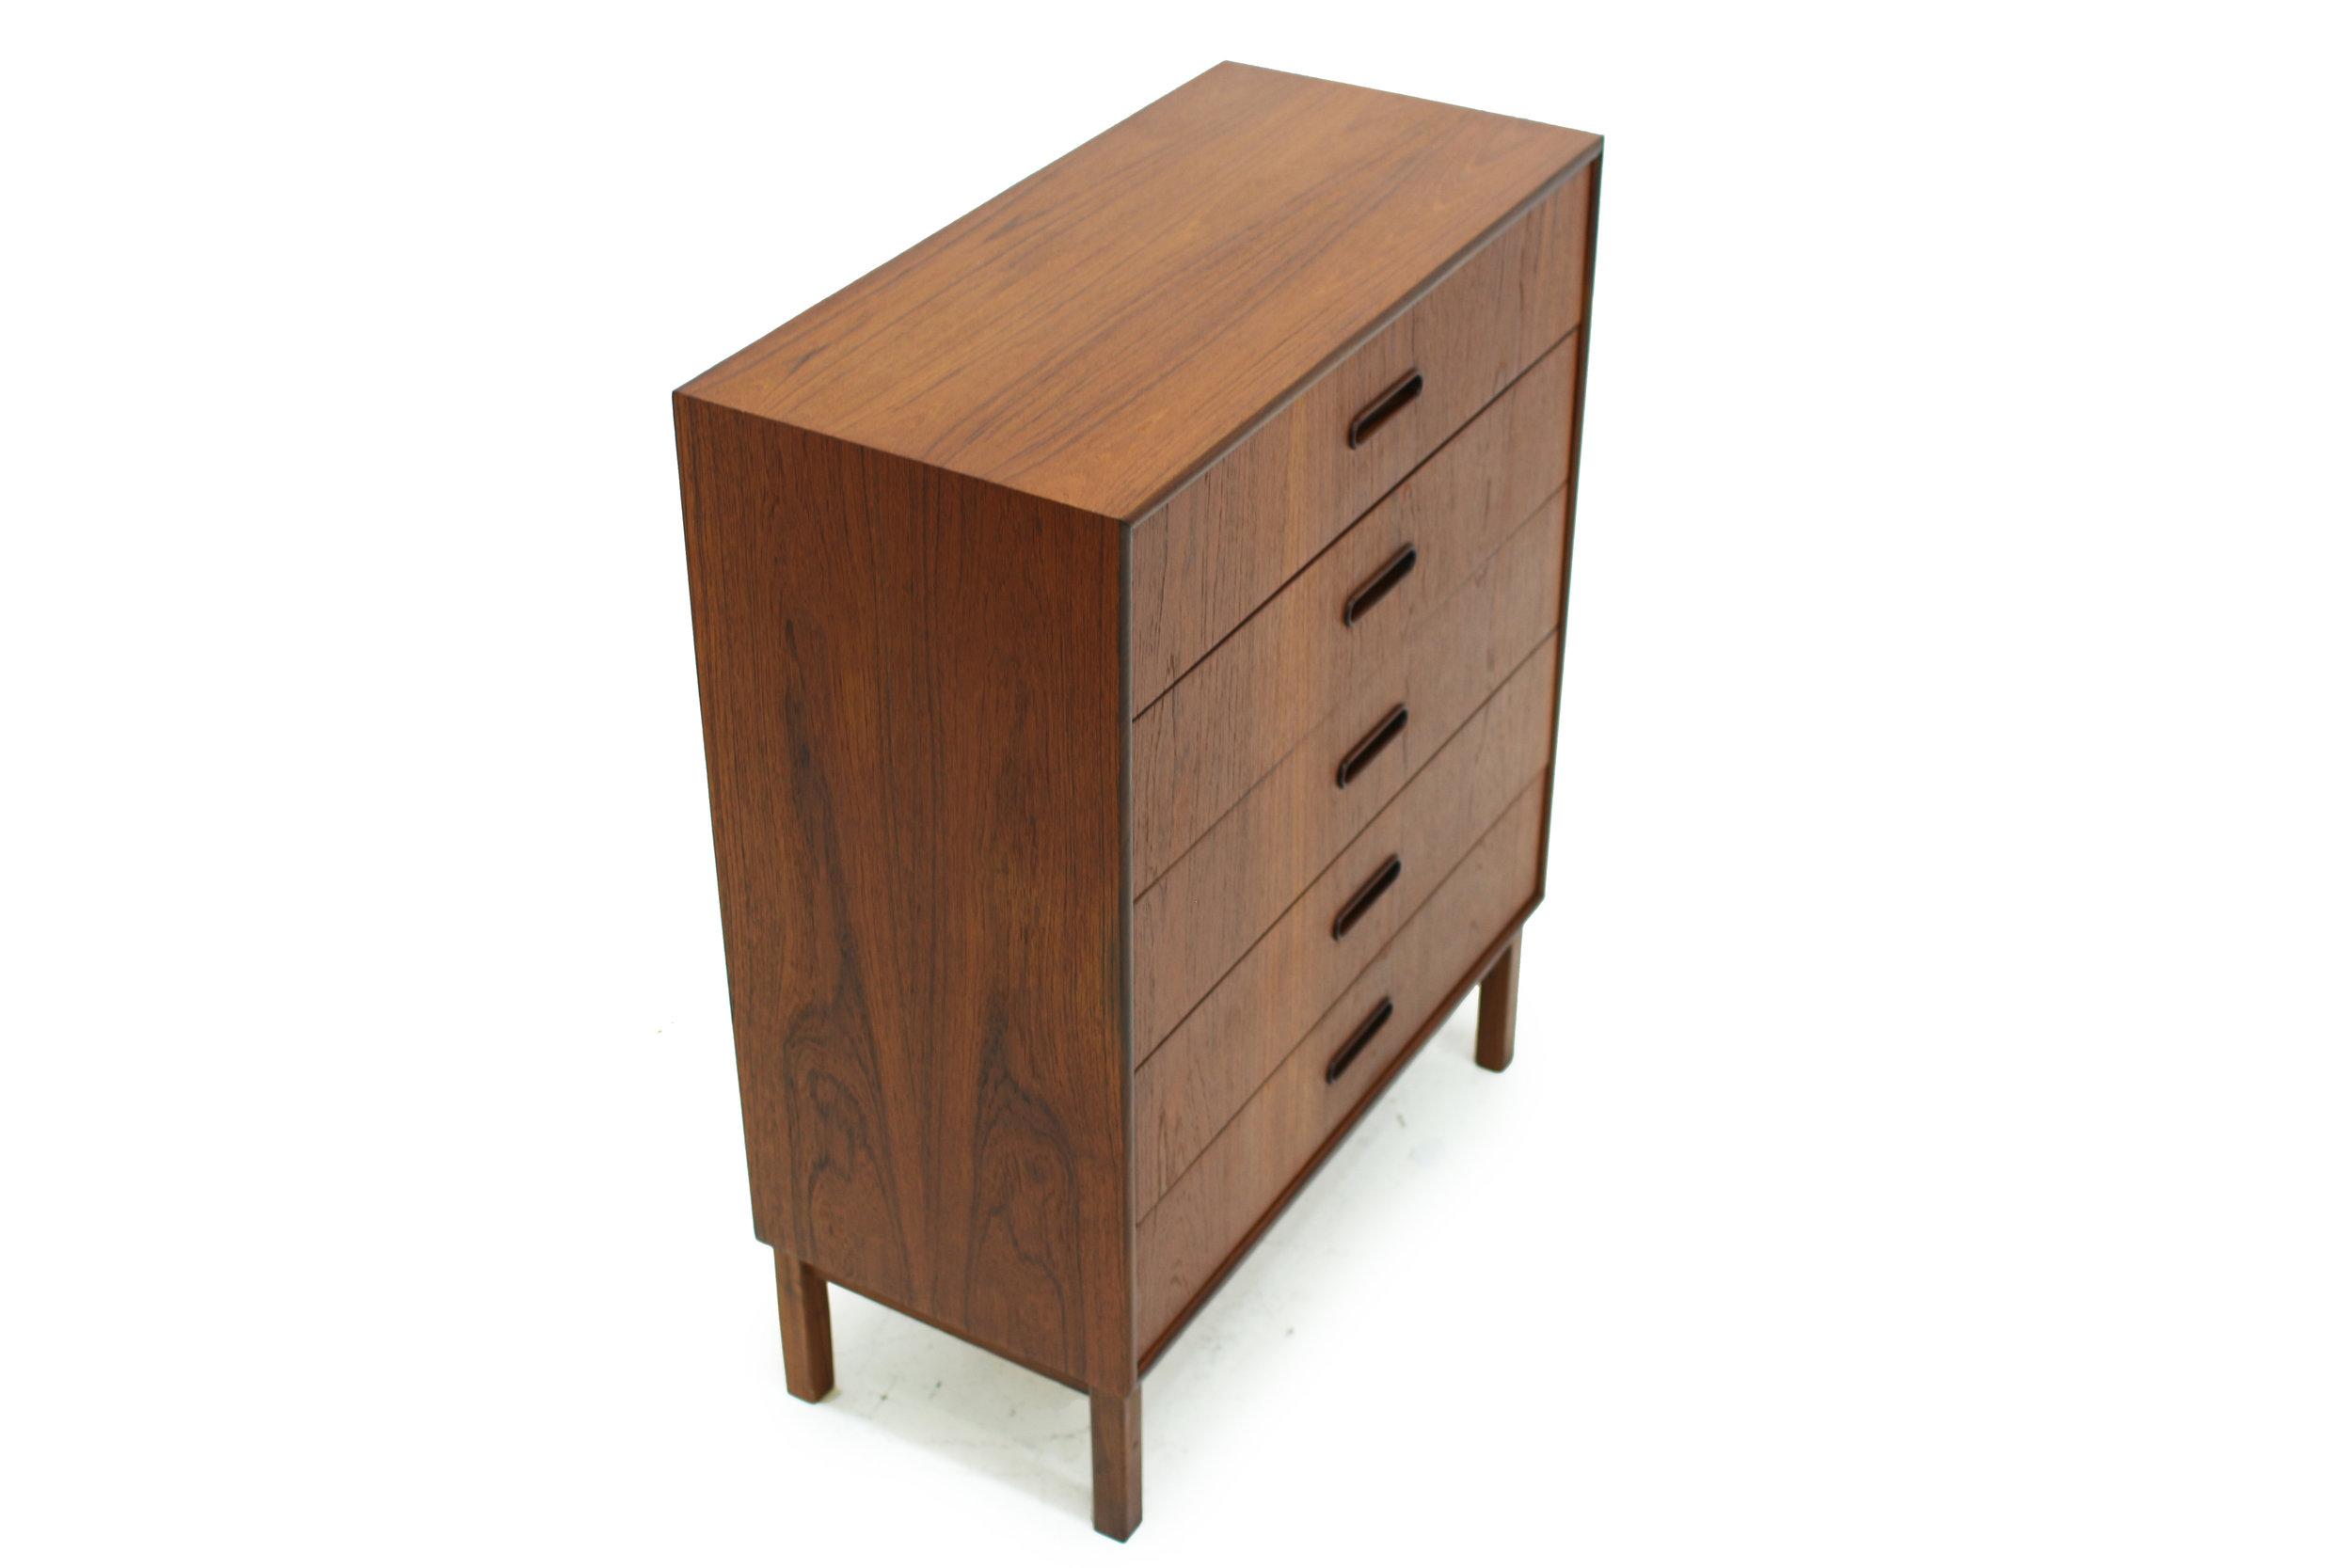 MCM Teak Tallboy Dresser made by Punch Design (1).jpg